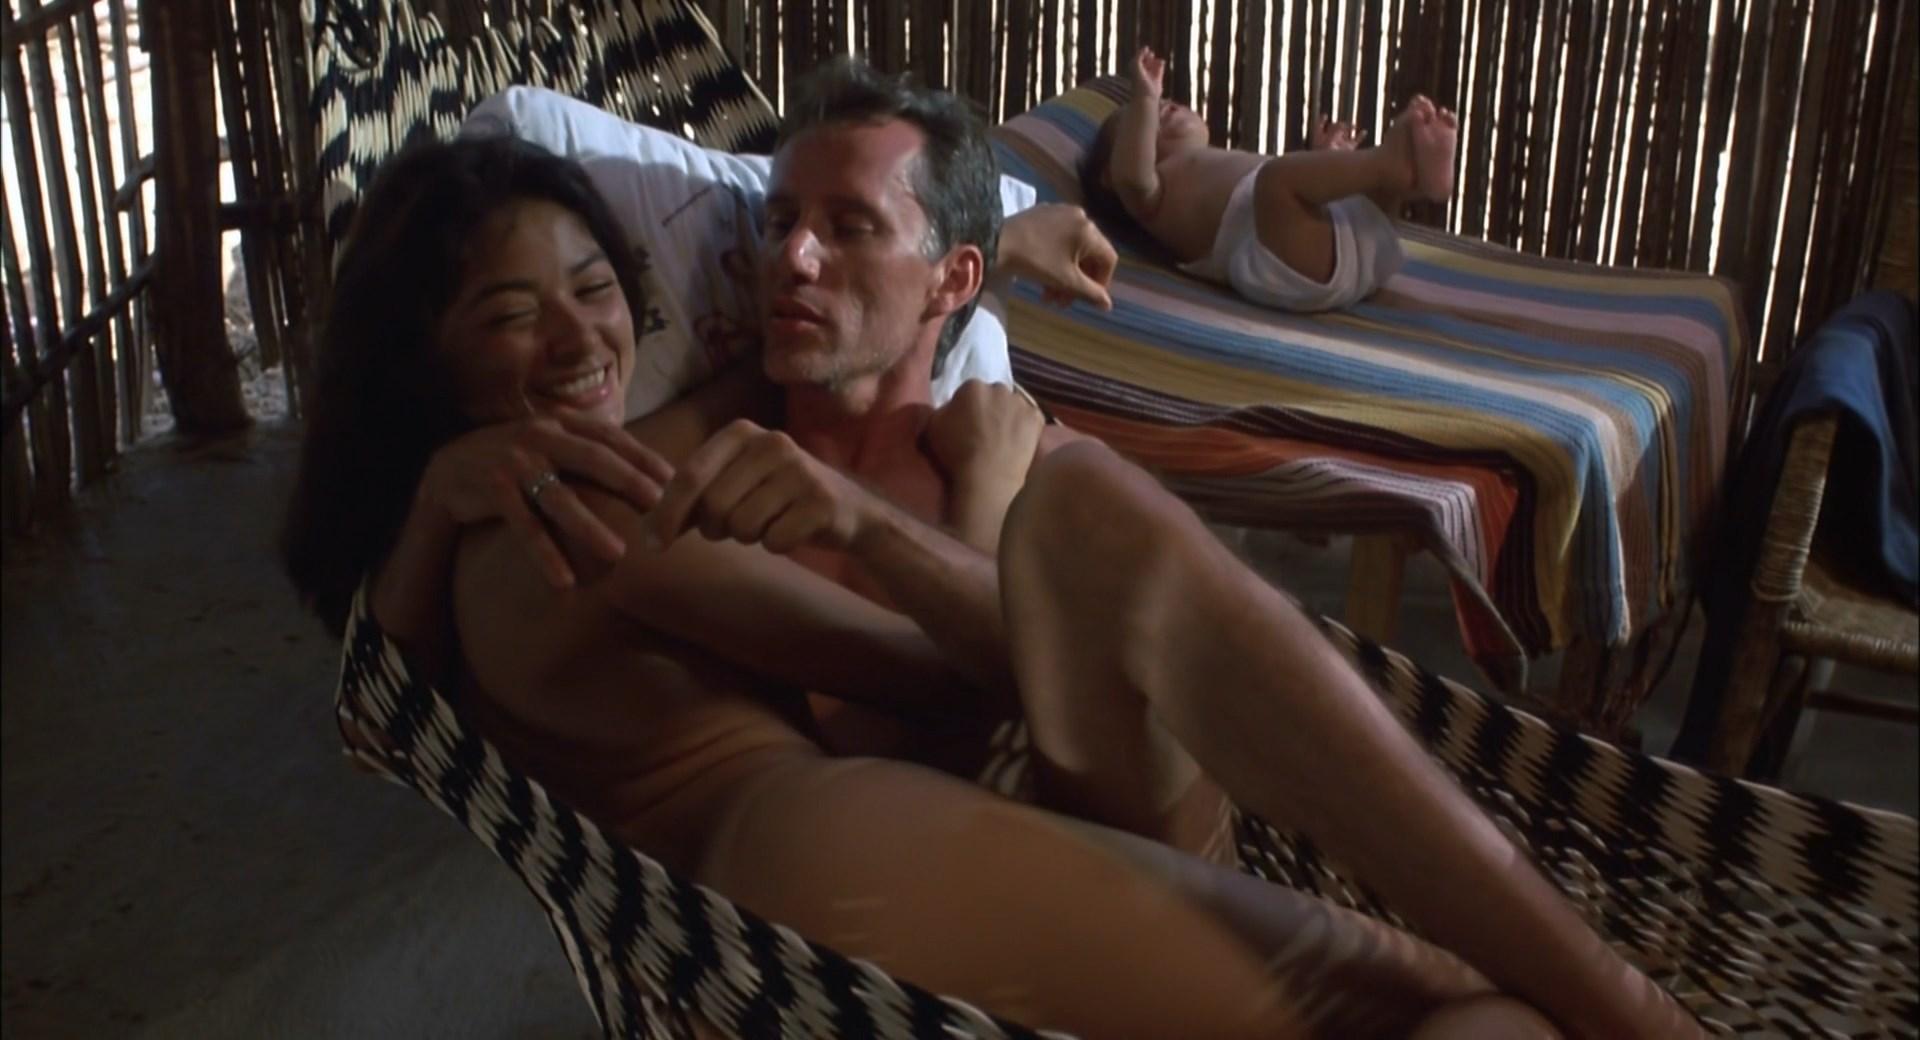 Can cynthia gibb nude video clip amusing moment